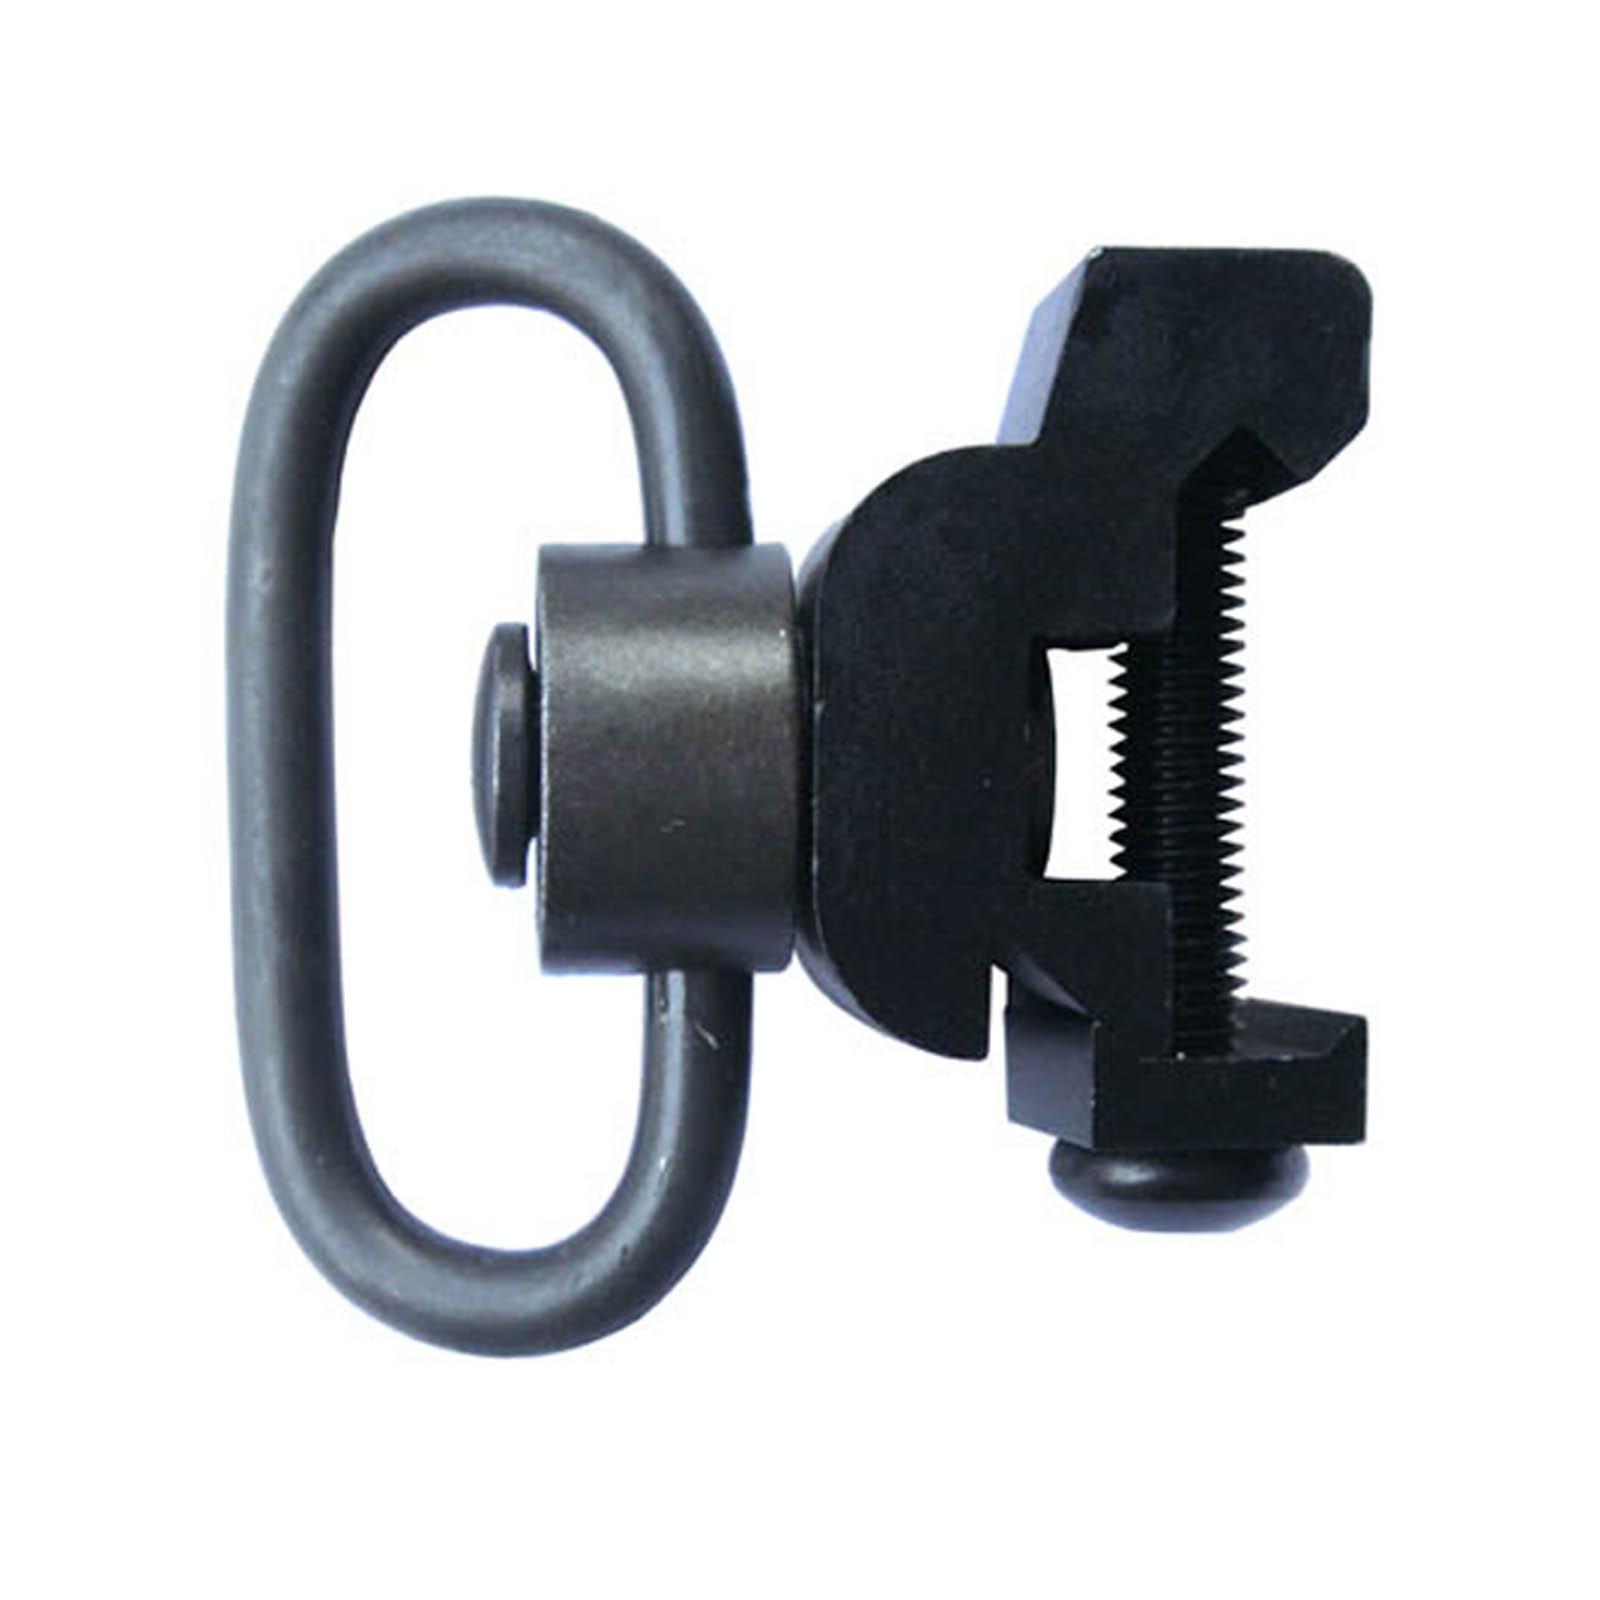 "QD quick release sling swivel attachment mount fits 20mm weaver rail 1.25/"" USA"